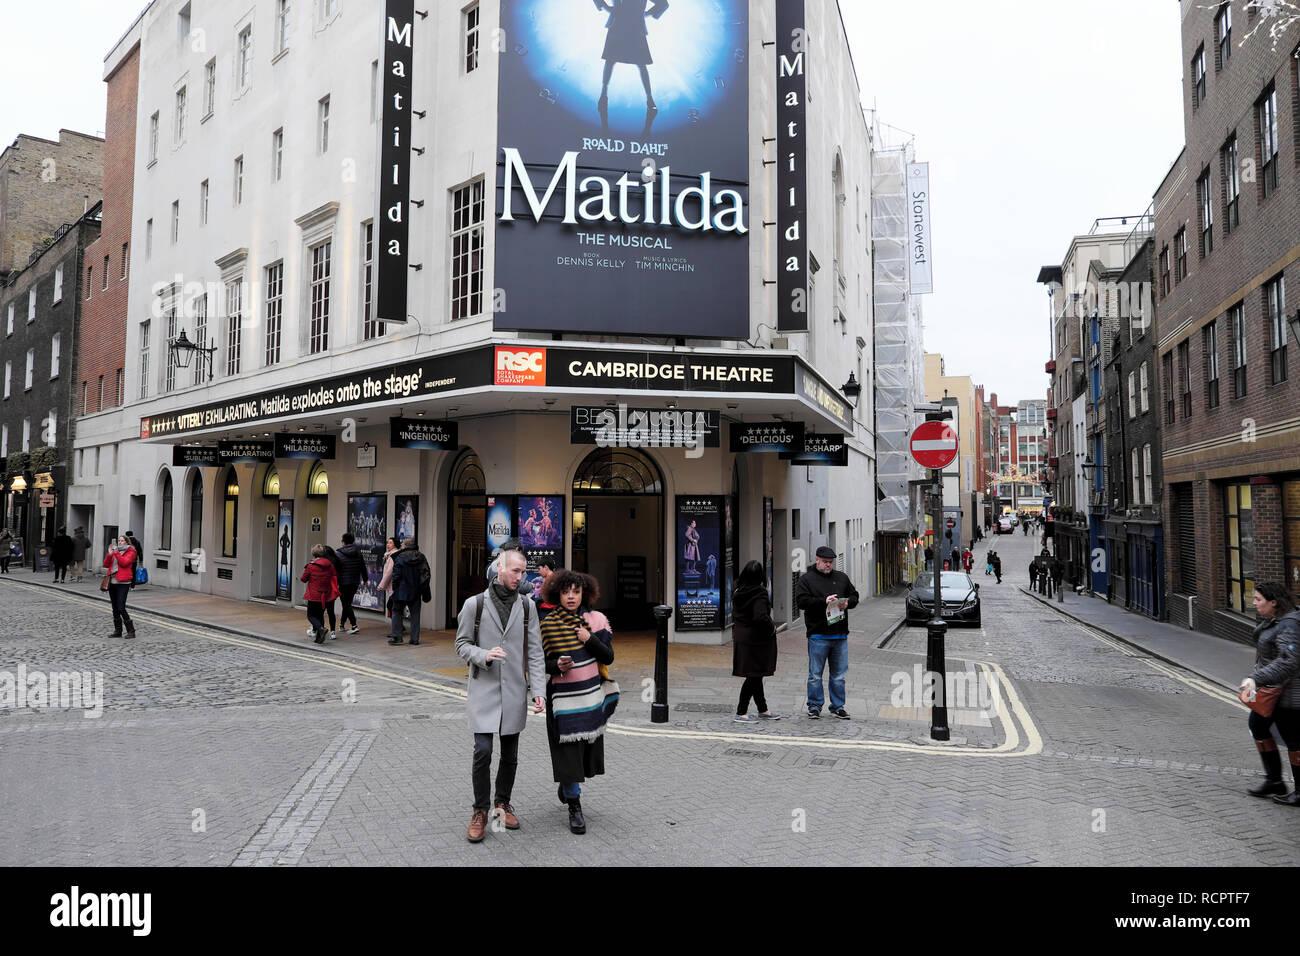 Cambridge Theatre street view of Matilda the musical Roald Dahl show in London England UK    KATHY DEWITT Stock Photo